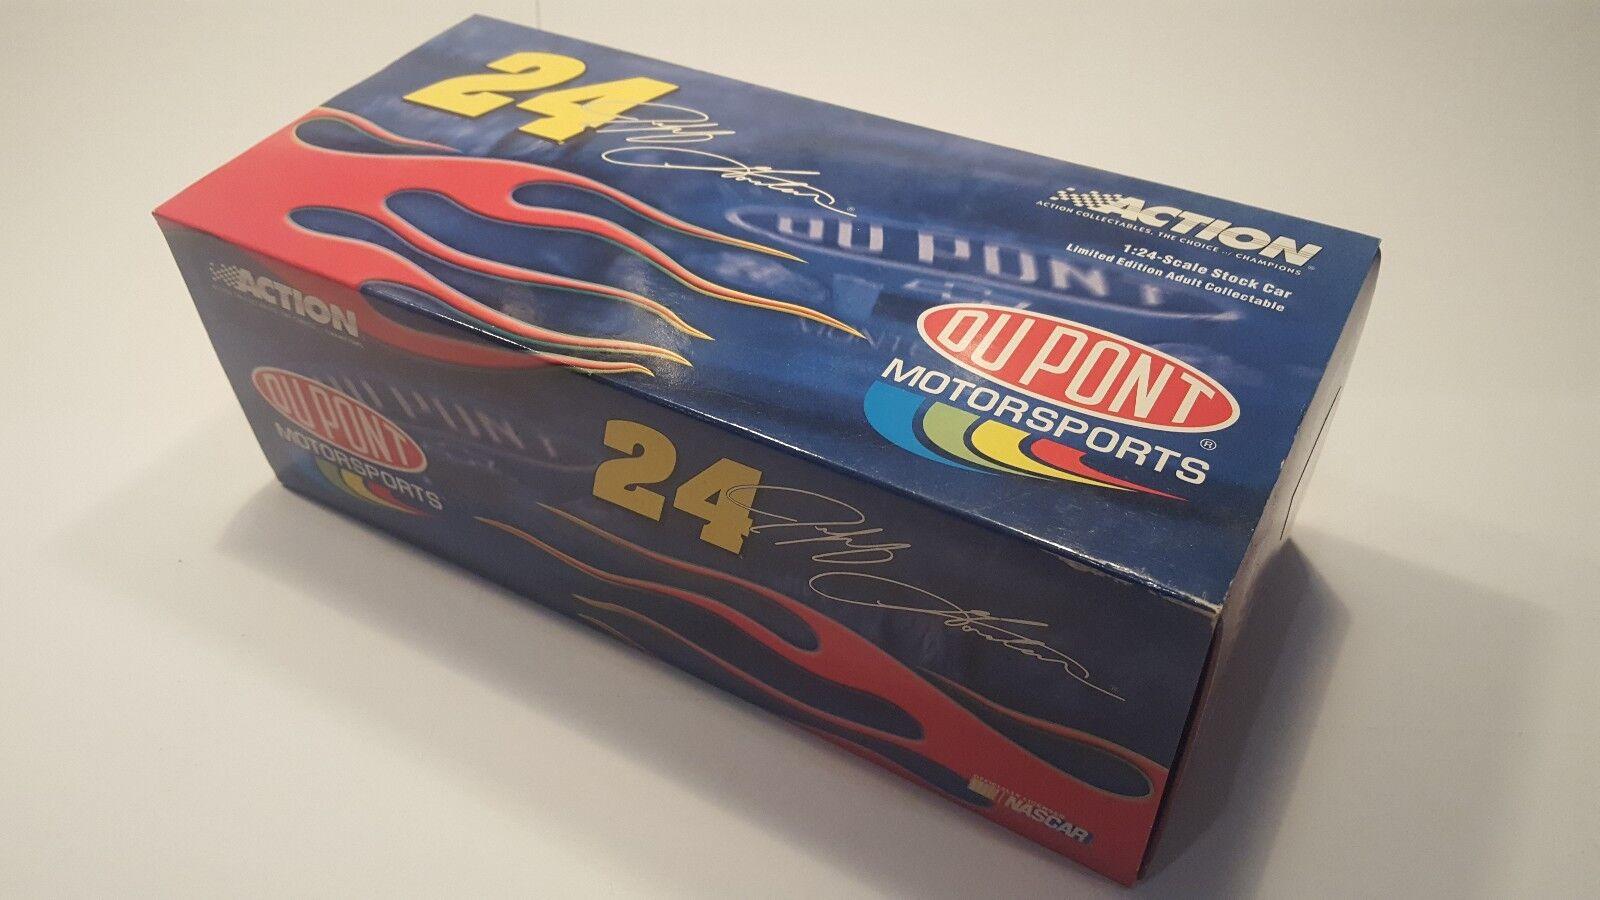 NIB NASCAR Diecast 1 24 scale collectable car, Jeff Gordon 2003 Monte Carlo